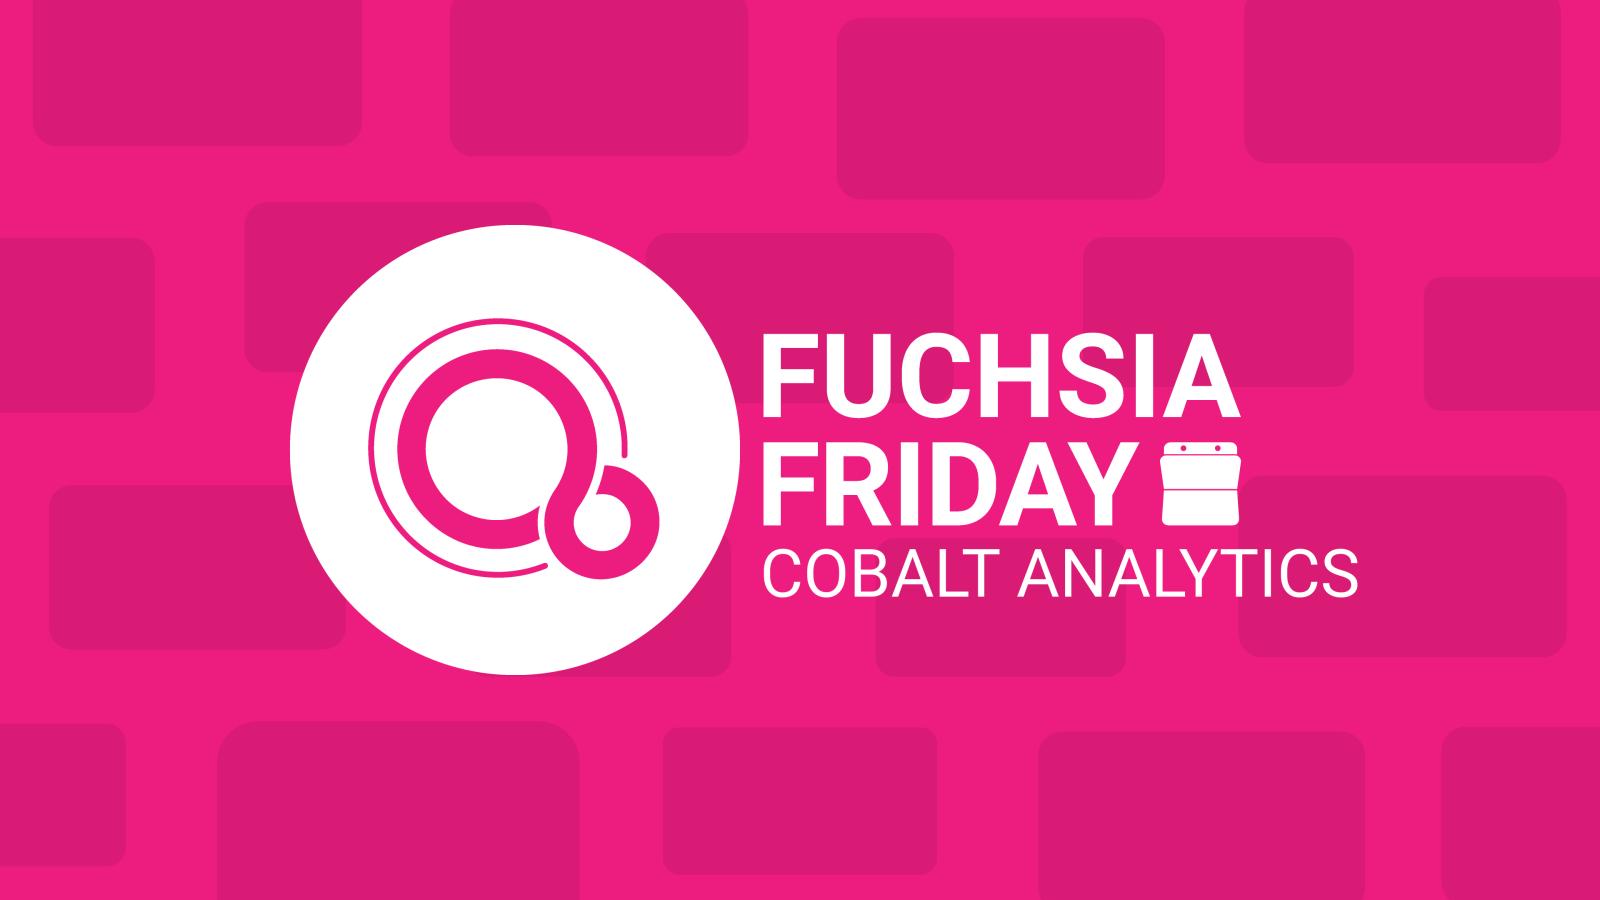 fuchsia friday cobalt is os wide google analytics